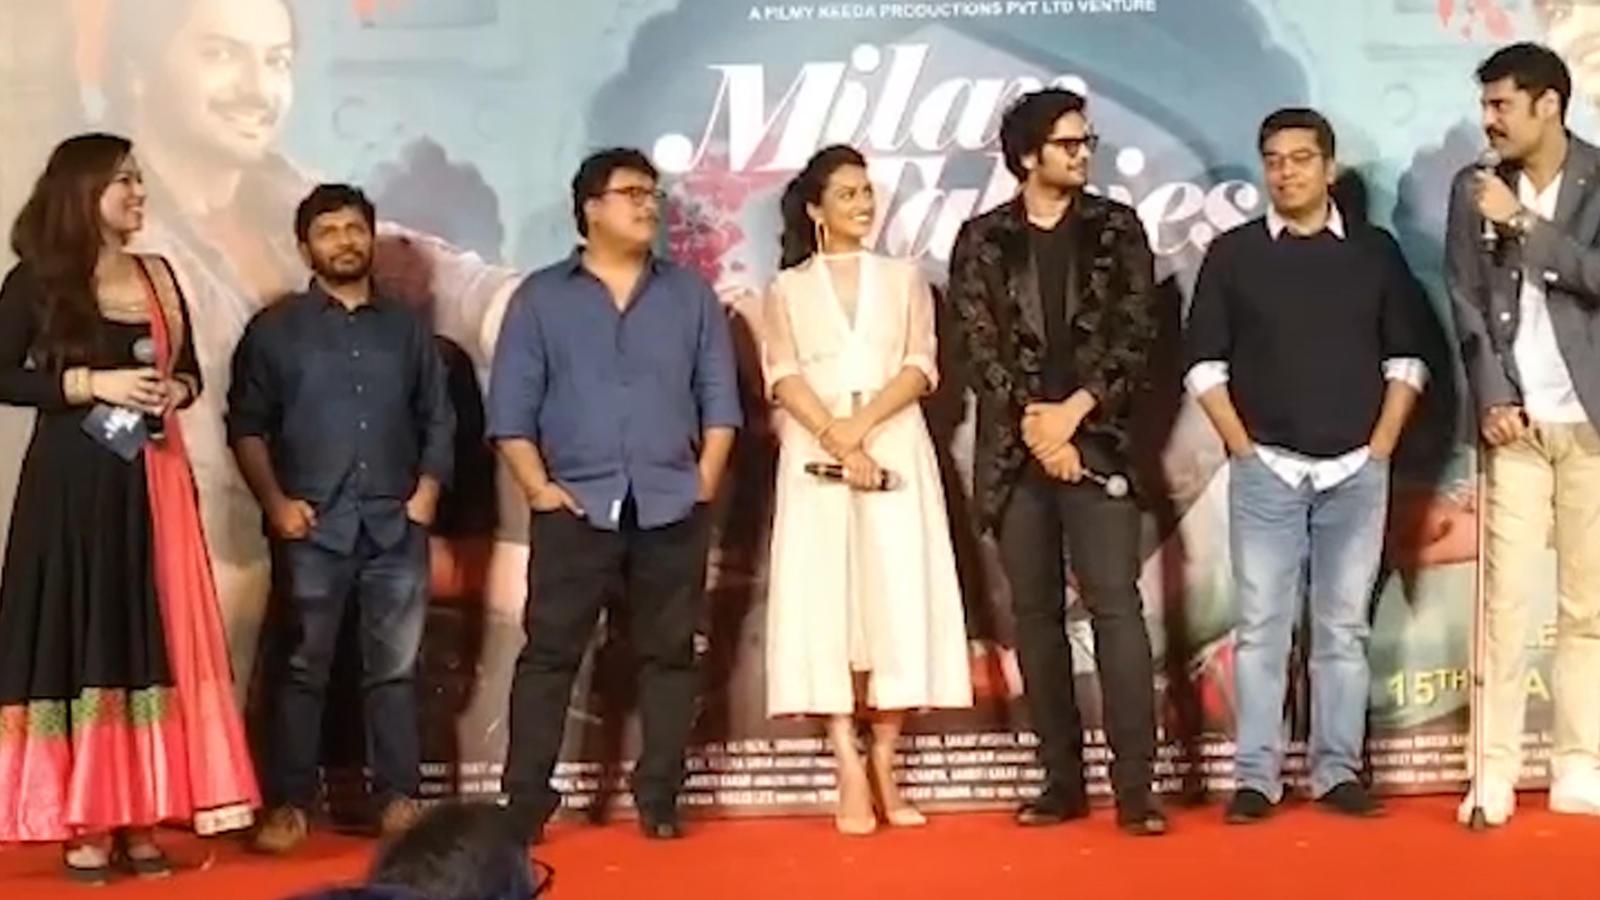 'Milan Talkies' trailer out: Ali Fazal, Shraddha Srinath starrer to release on March 15